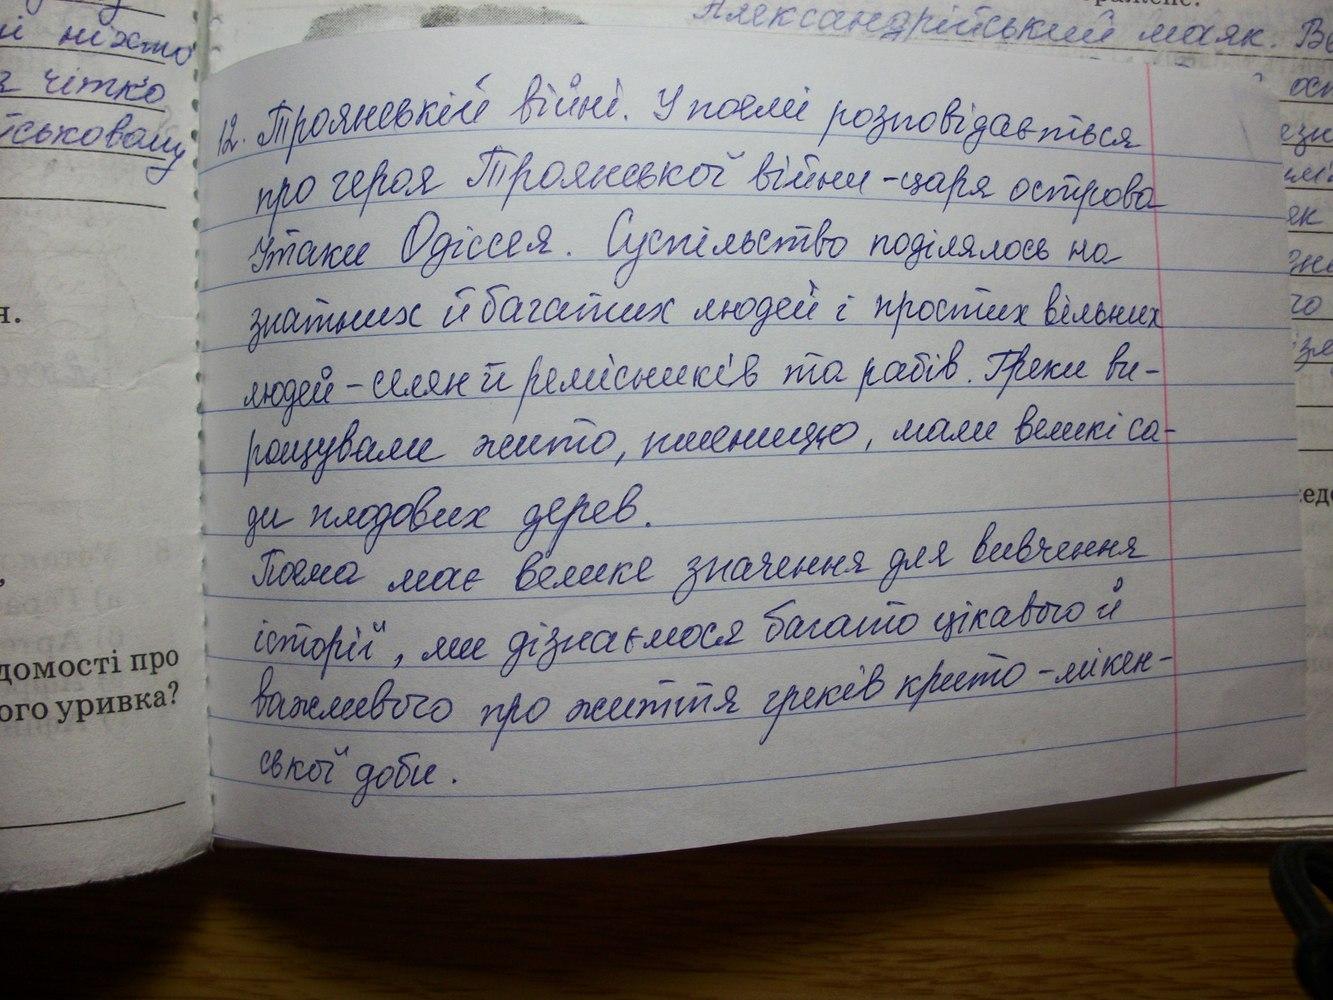 ГДЗ рабочие тетради 6 класс. Задание: стр. 26 (2)